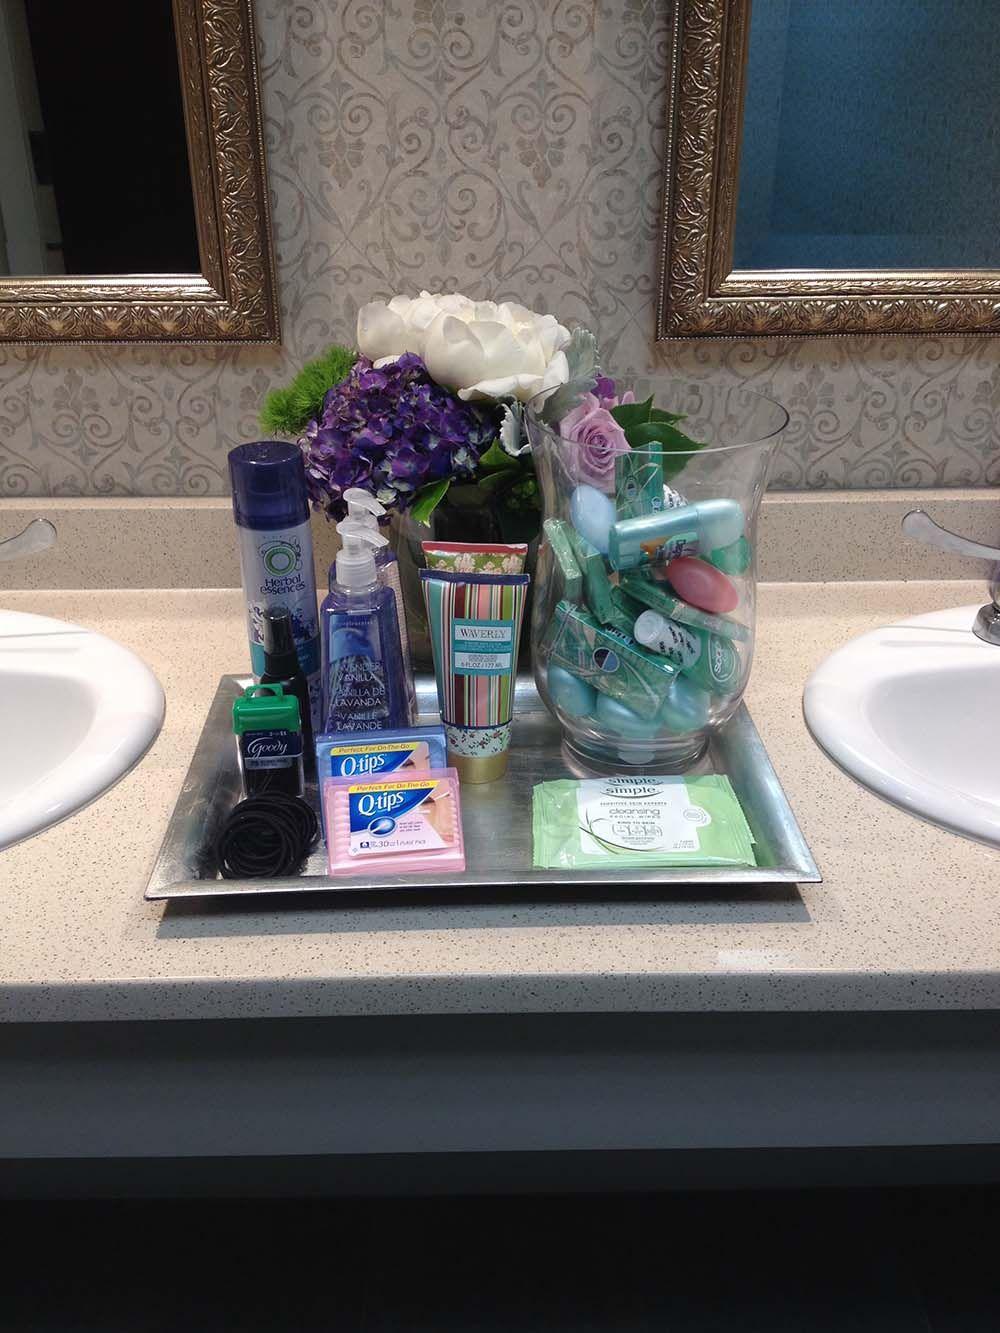 Must Haves For Wedding Bathroom Baskets Wedding Bathroom Bathroom Baskets Bathroom Basket Wedding